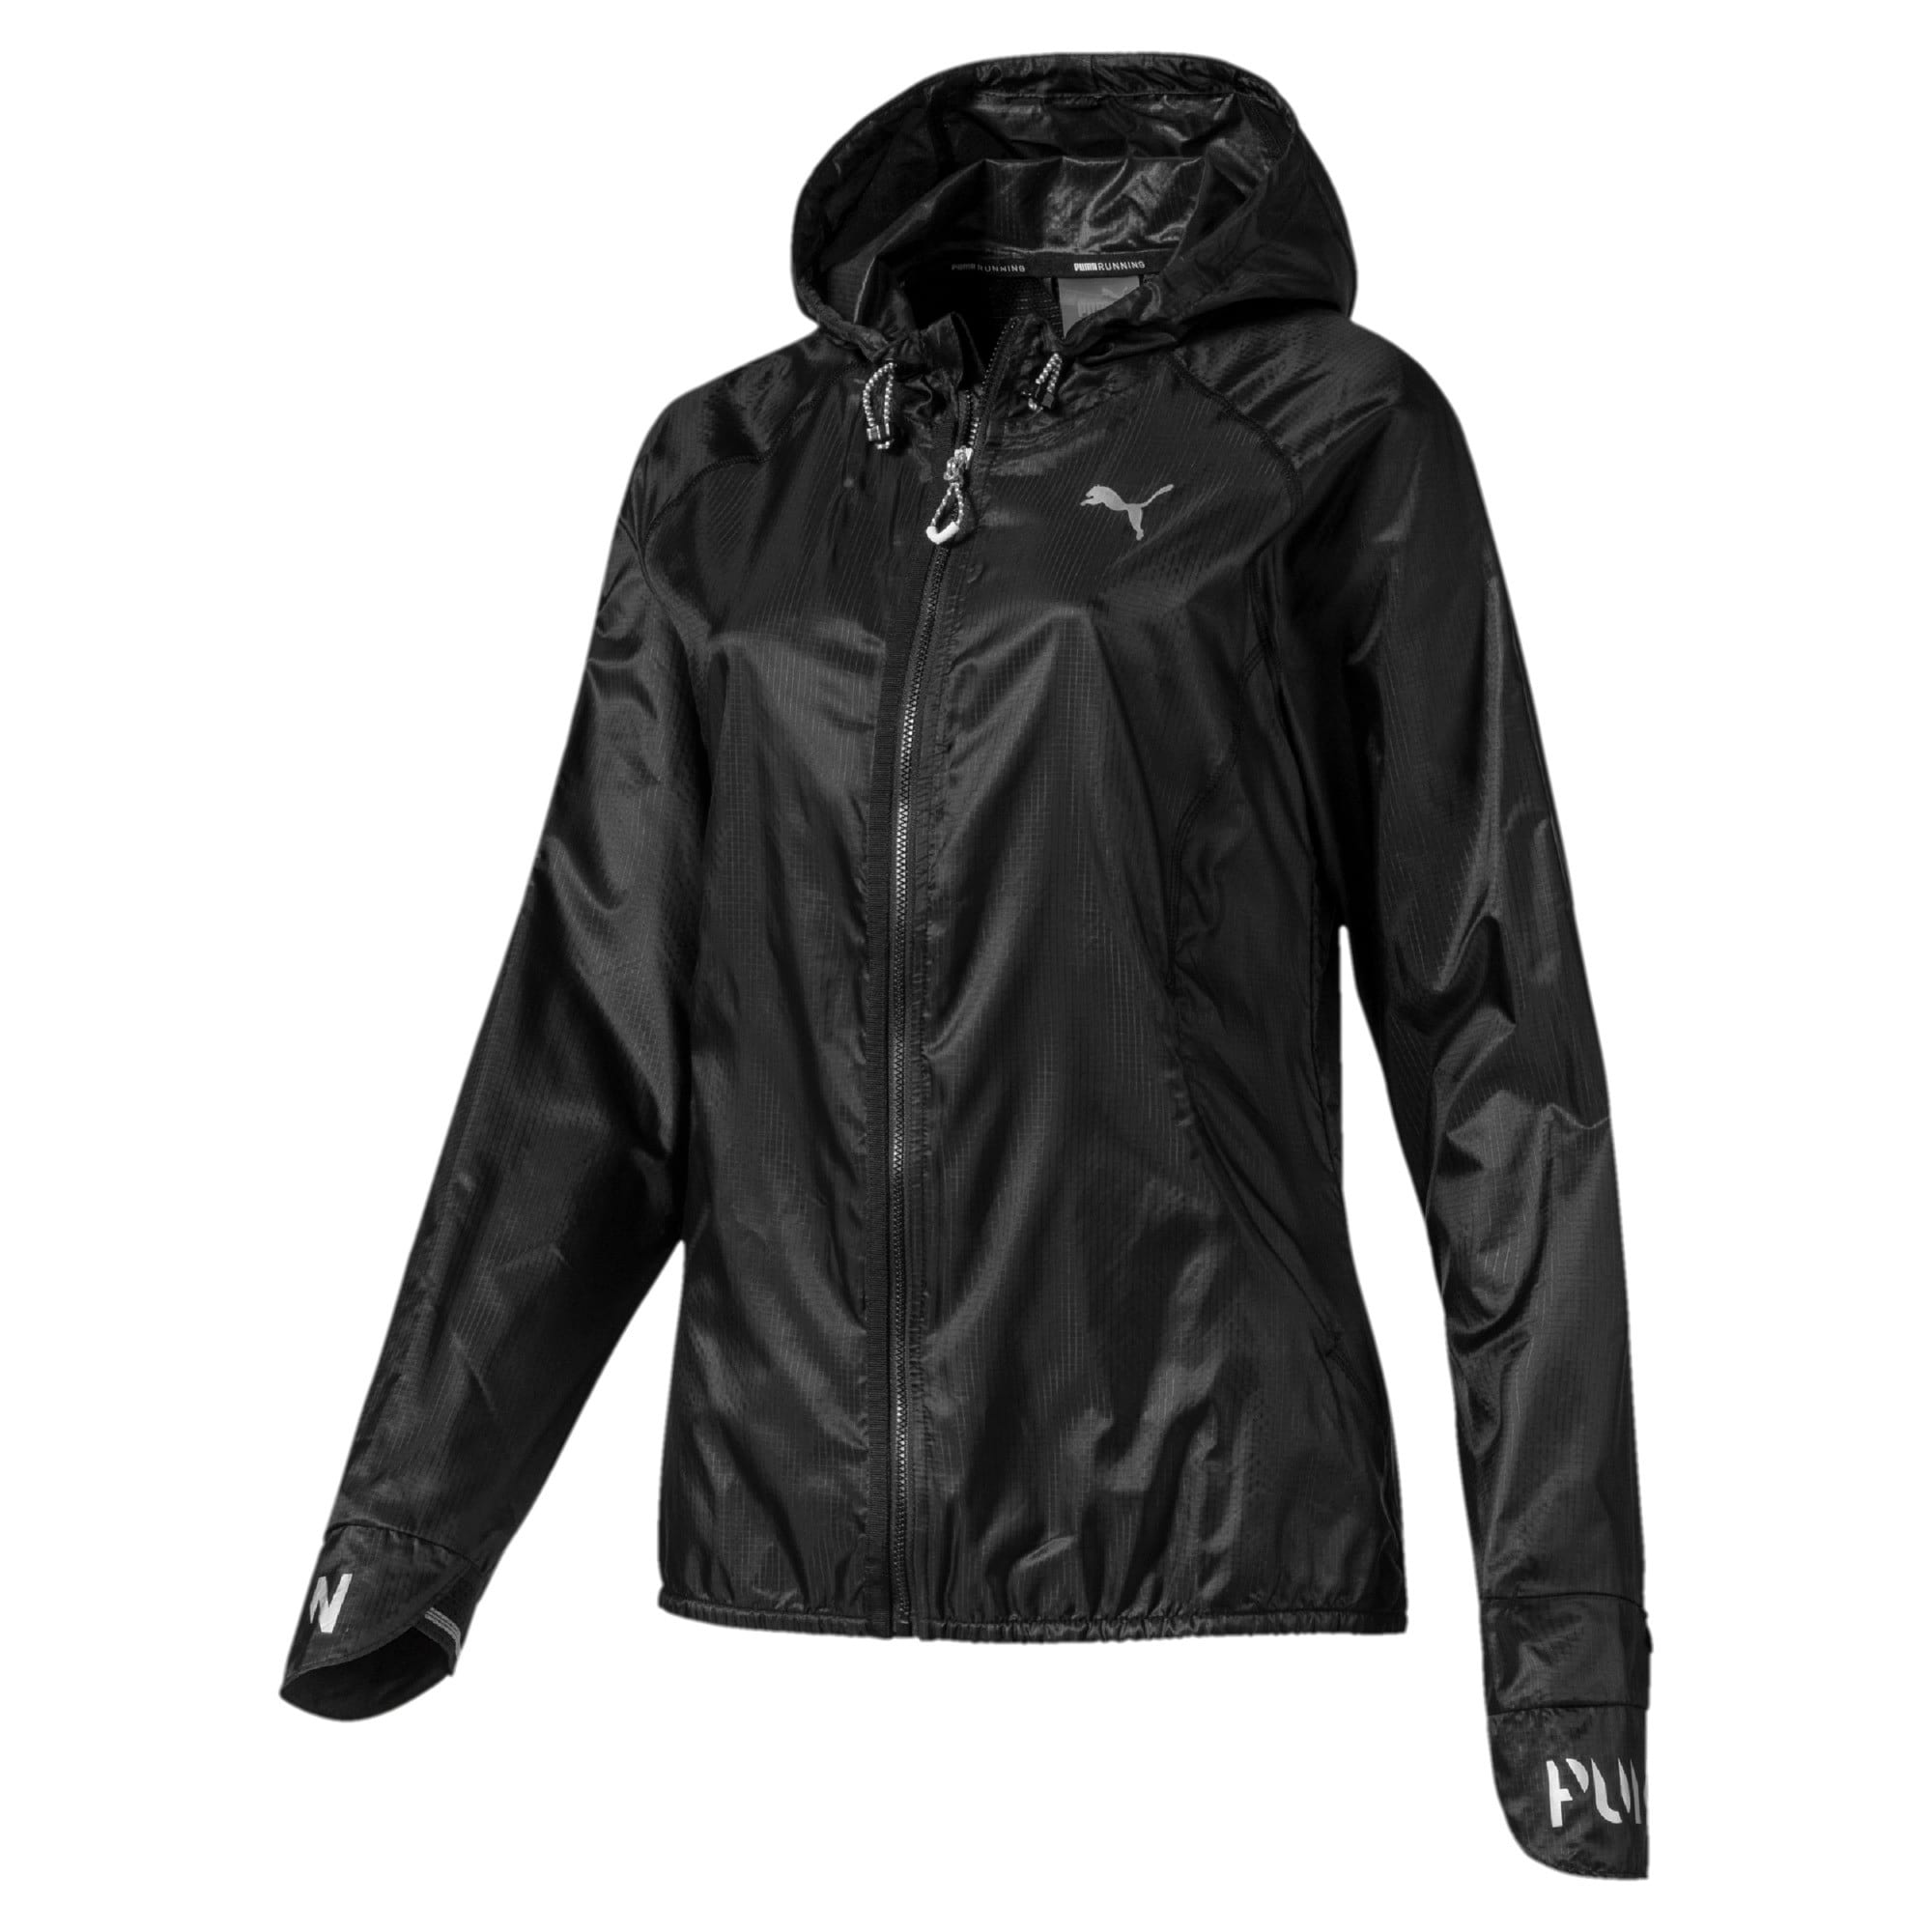 Thumbnail 4 of Get Fast Hooded Full Zip Women's Running Jacket, Puma Black, medium